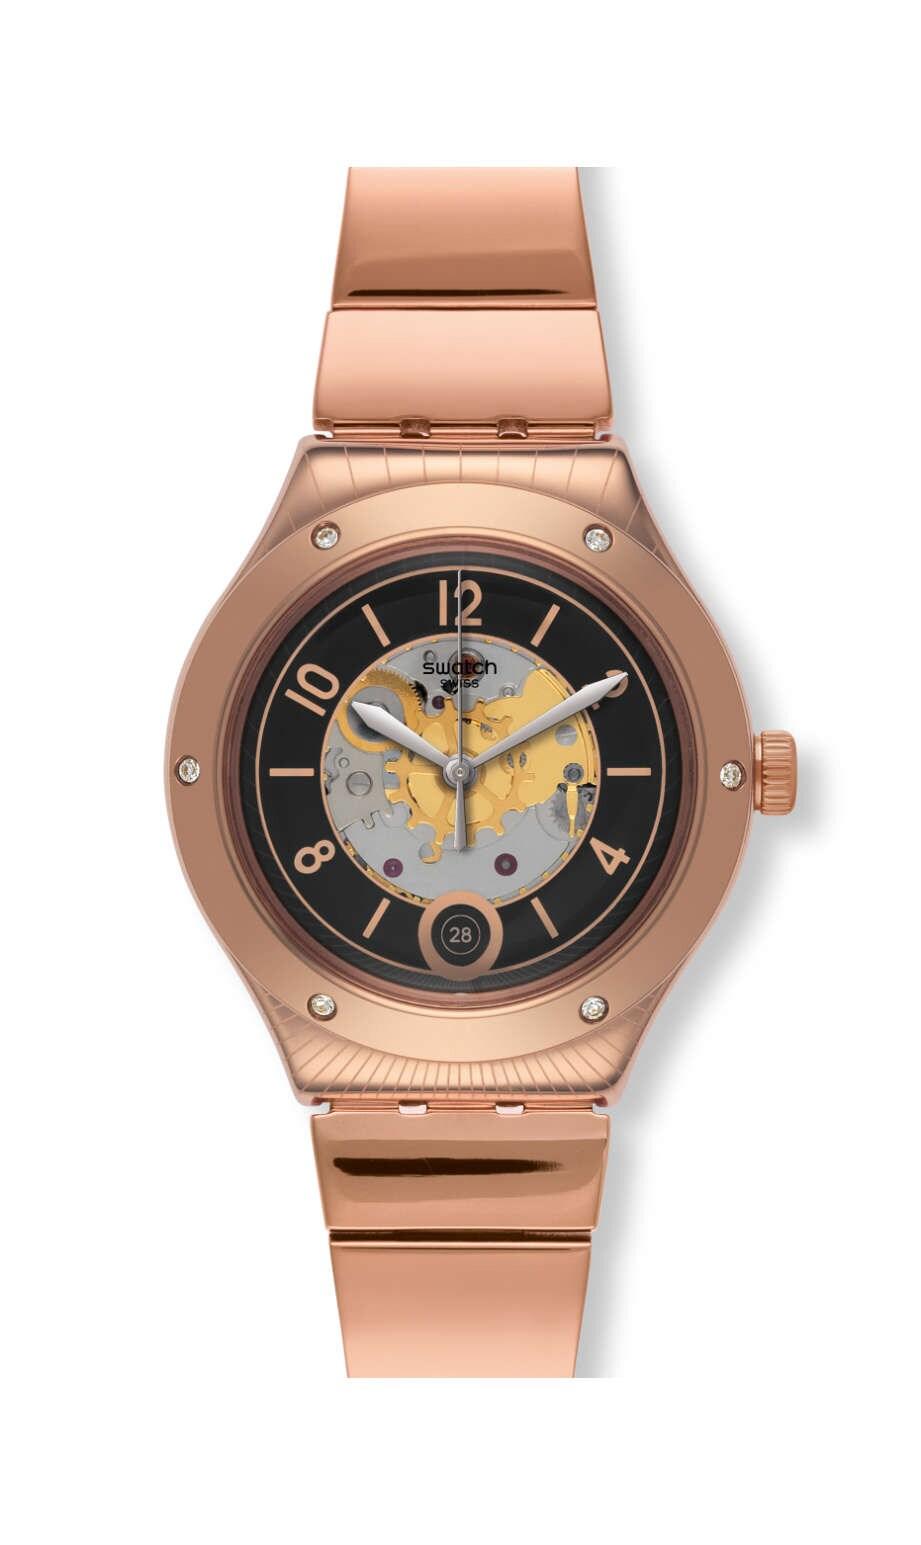 Swatch - TONTON PHIL - 1